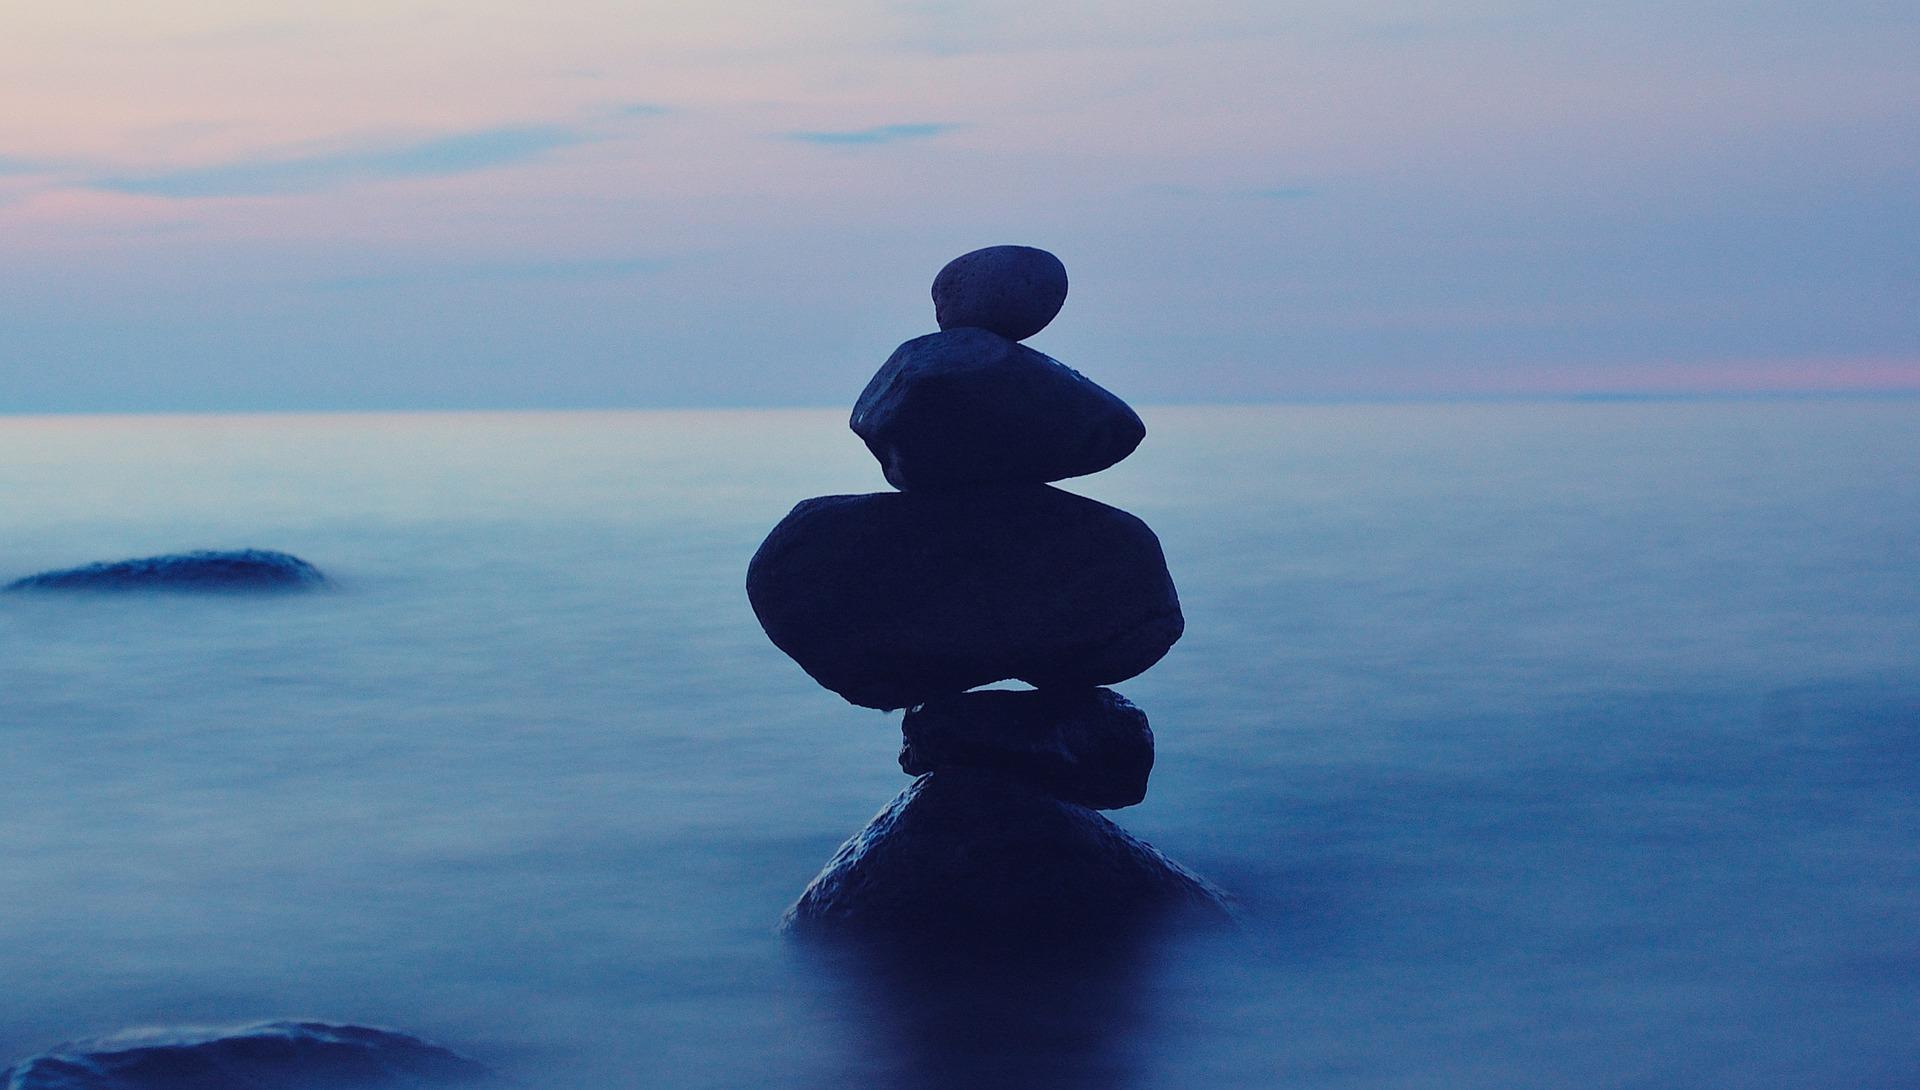 Hypnosis Singing Bowl Yoga Nidra